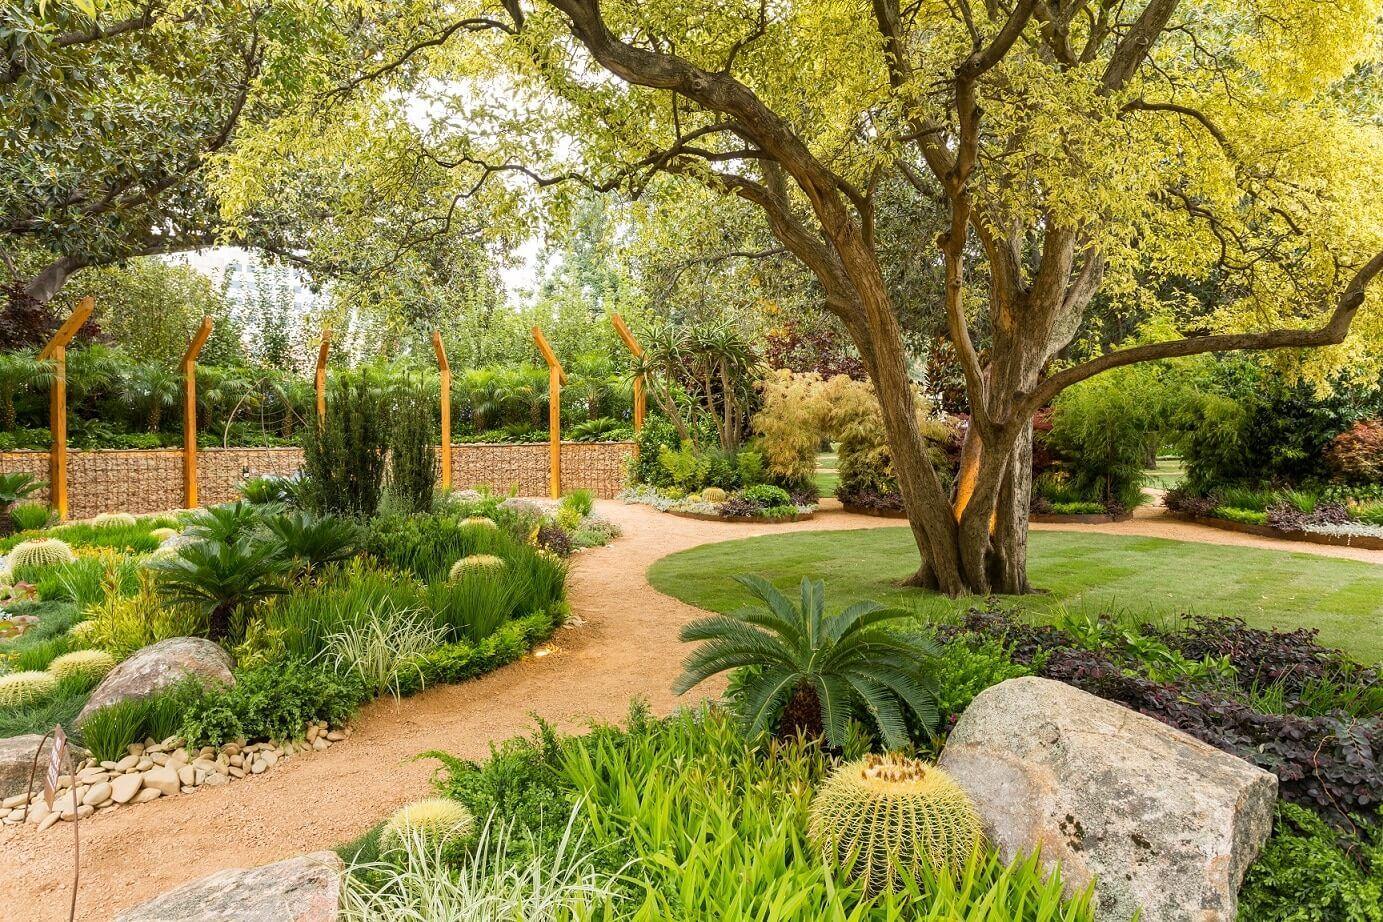 The Awestruck Garden Design Trends 10  Backyard ideas for small